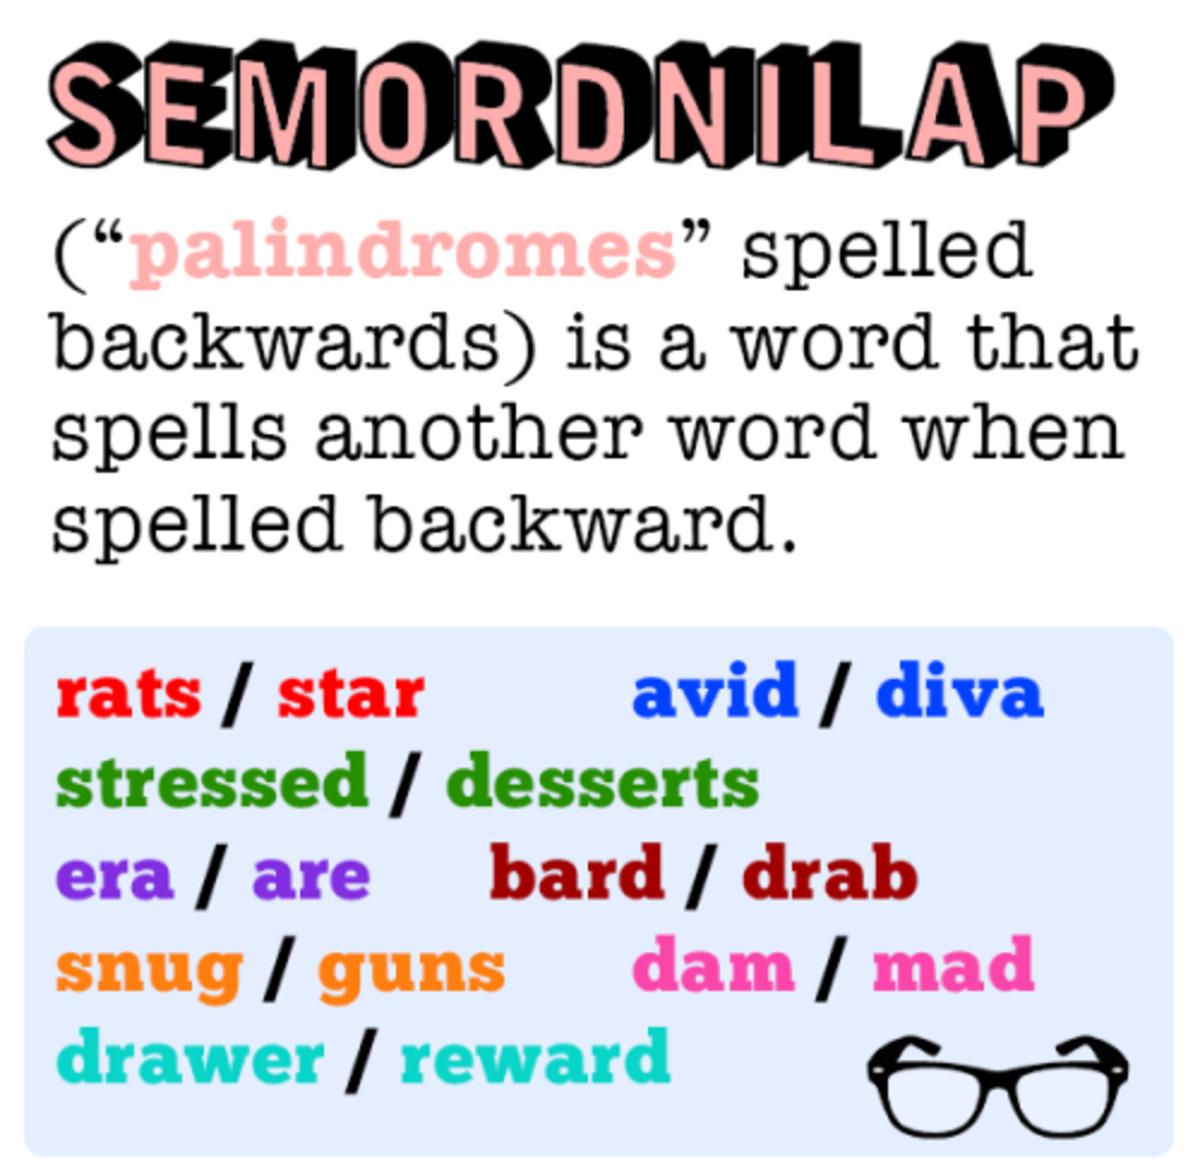 LIVE - EVIL: an Ambigram and Semordnilap? | hubpages